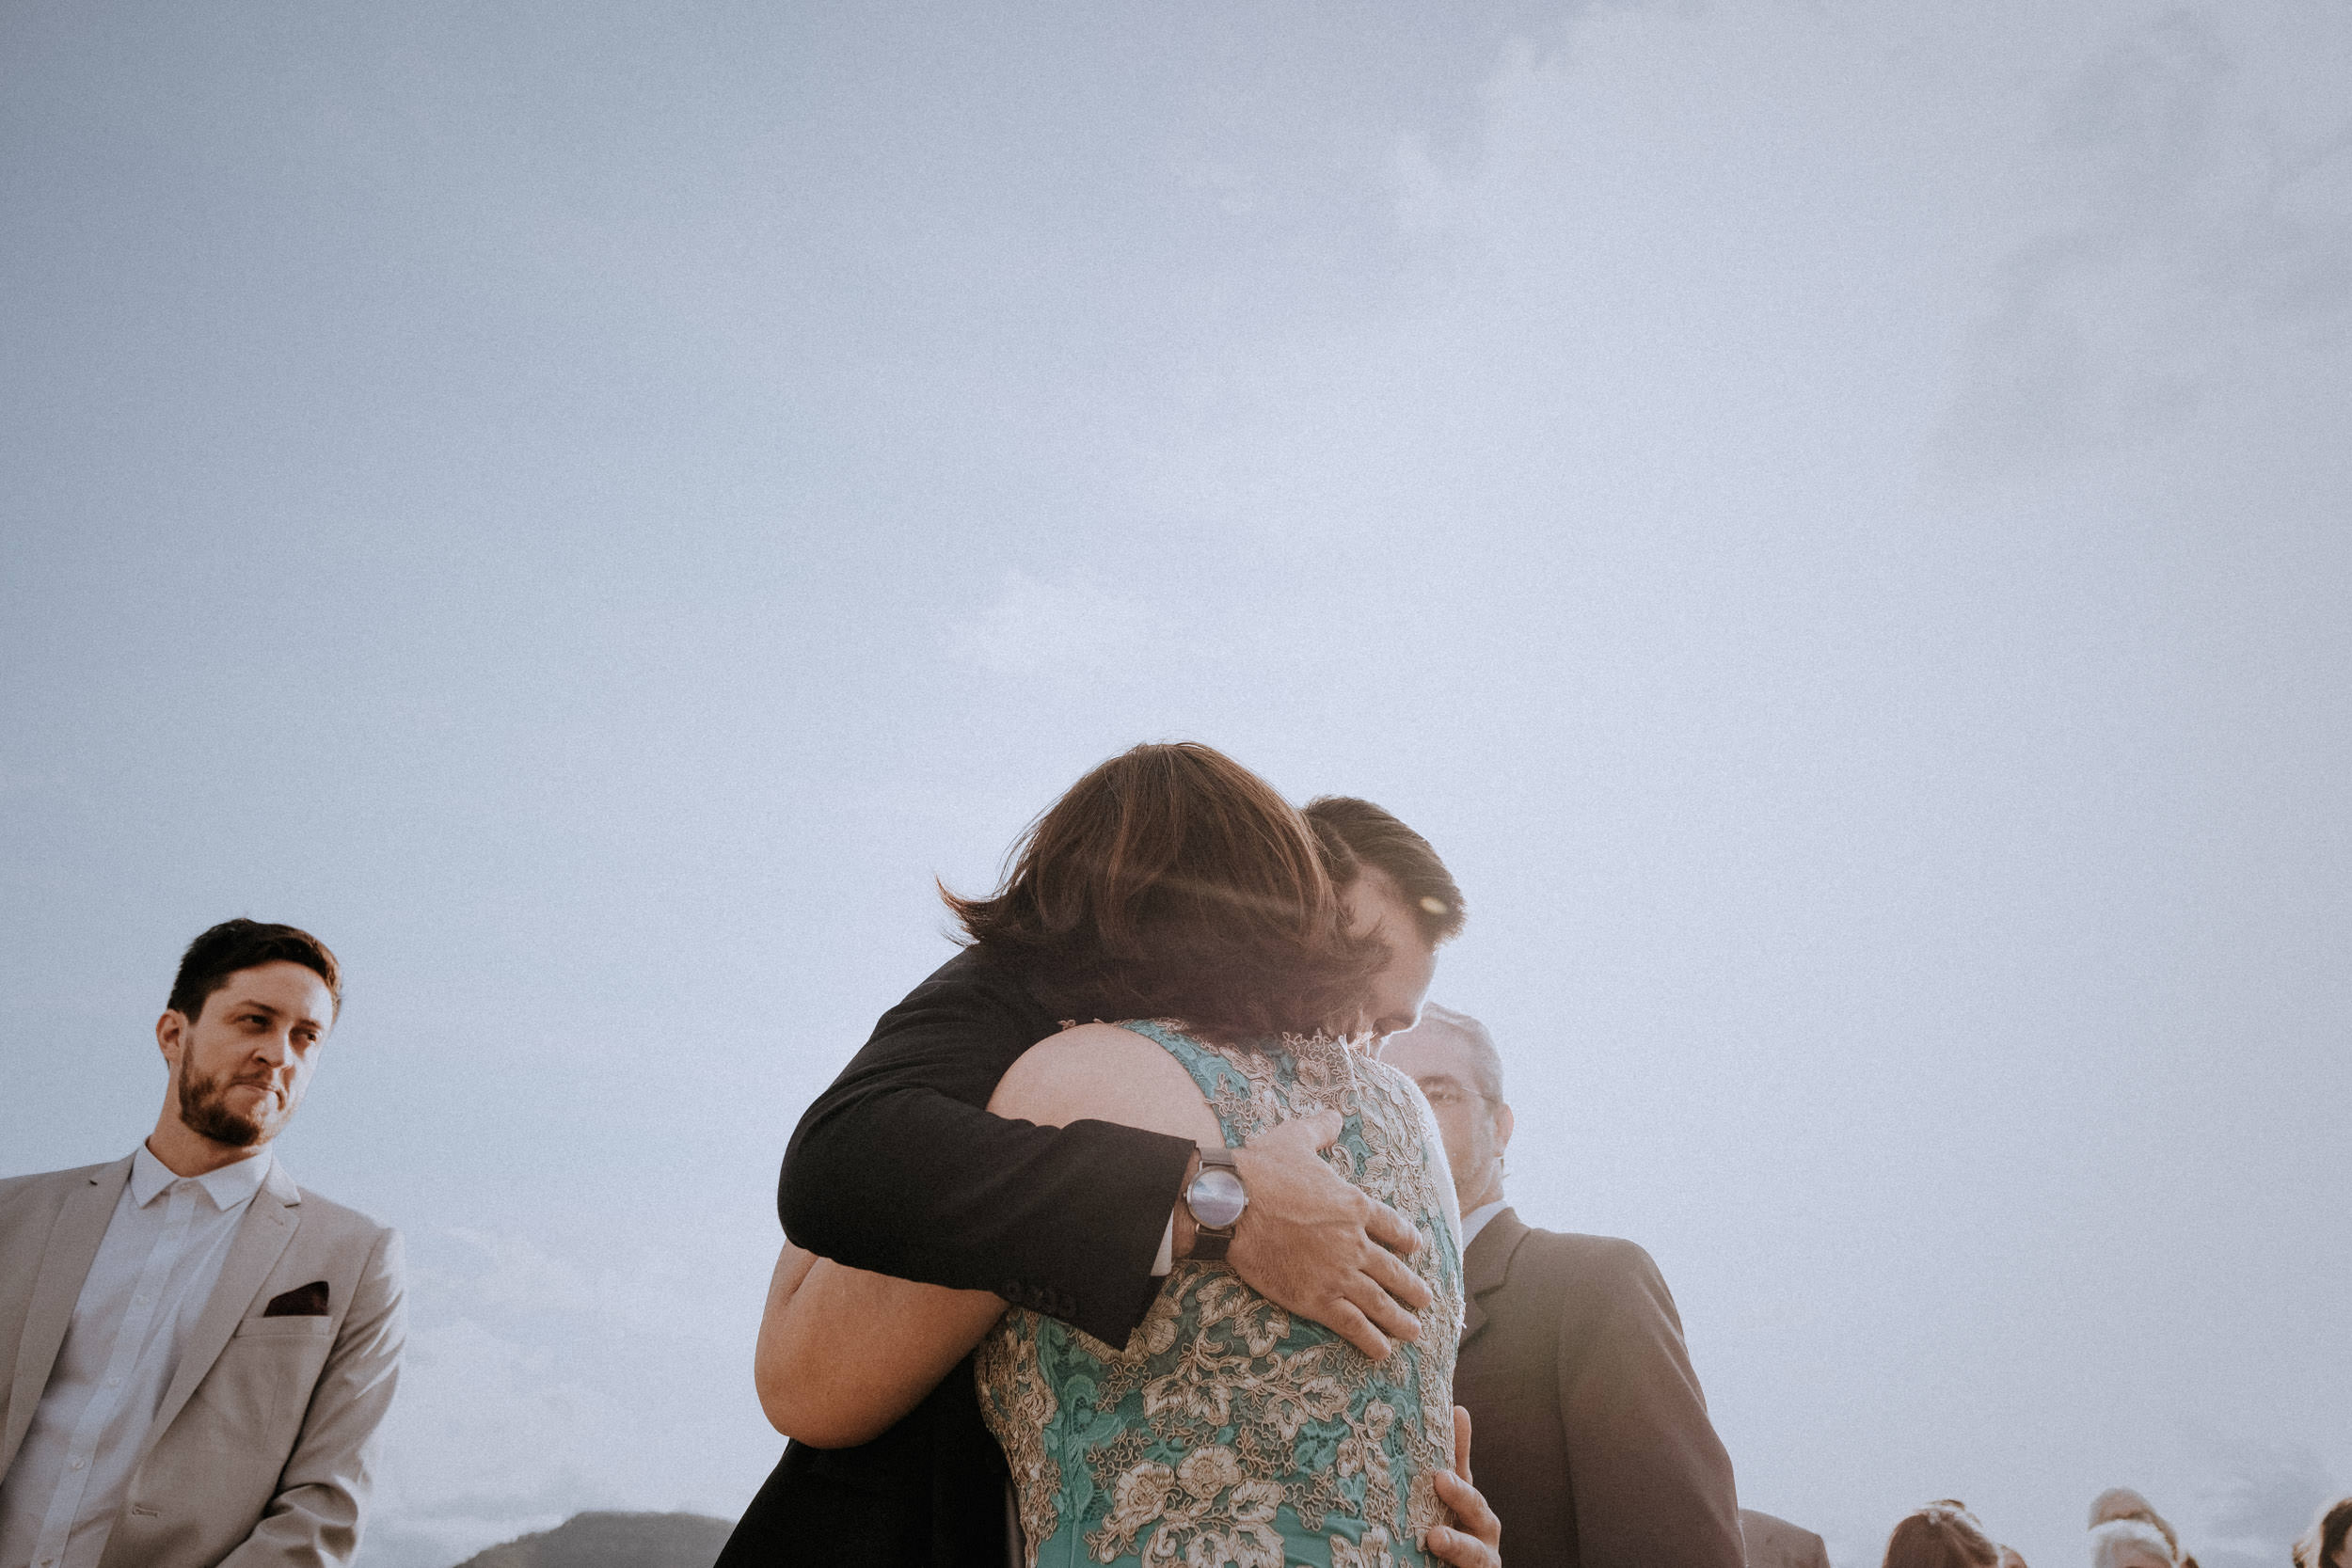 s+j_top_elopement wedding photography_kings & thieves_blog - 192.jpg